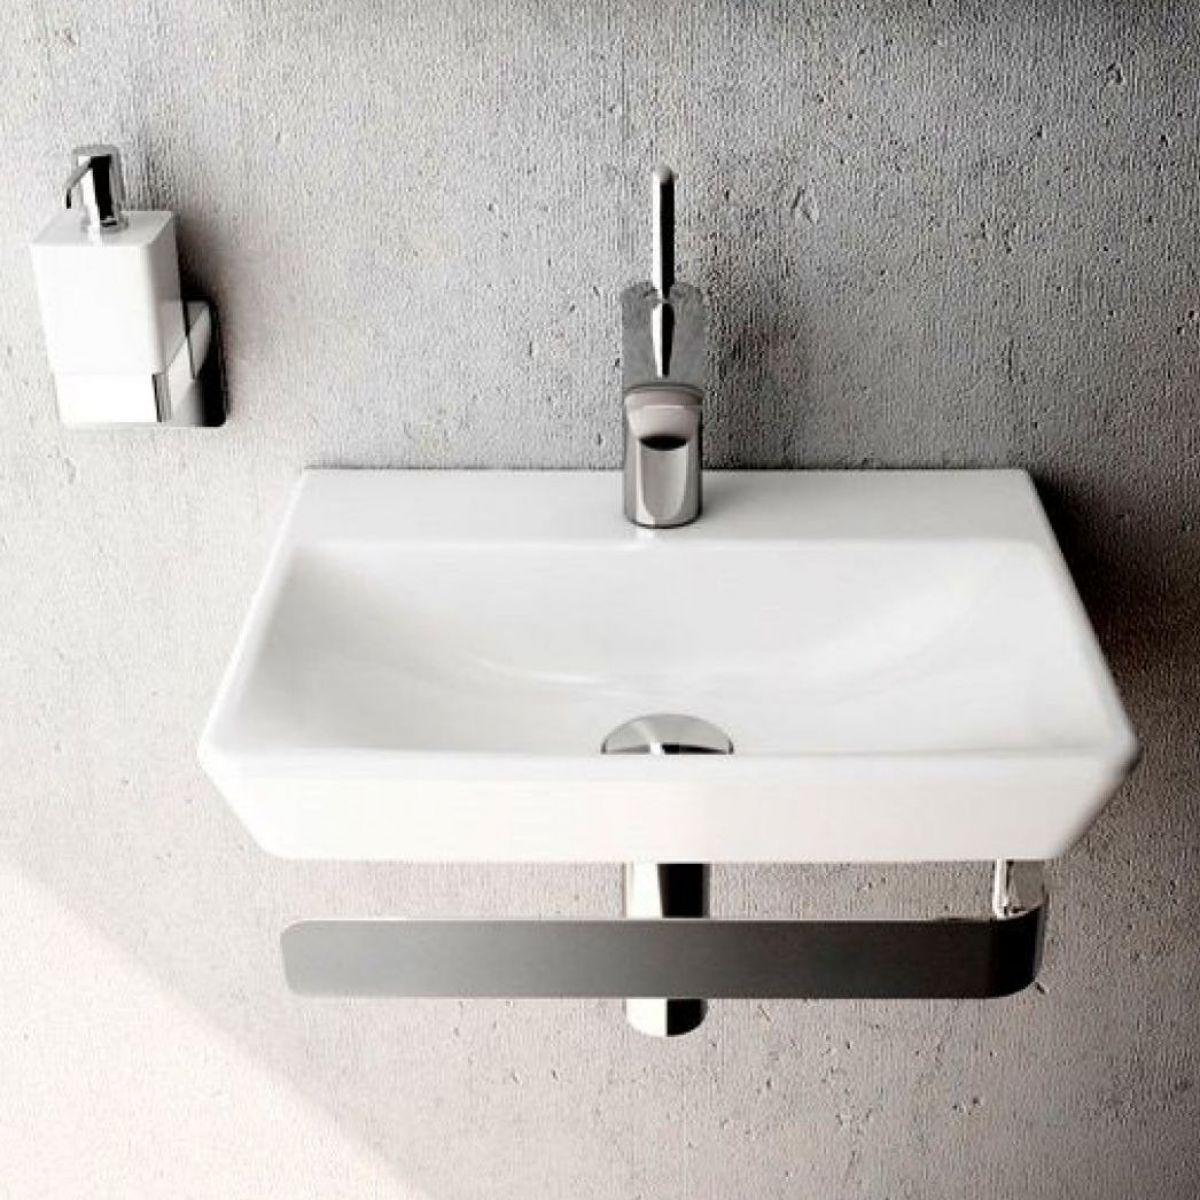 Superbe Vitra T4 Cloakroom Basin